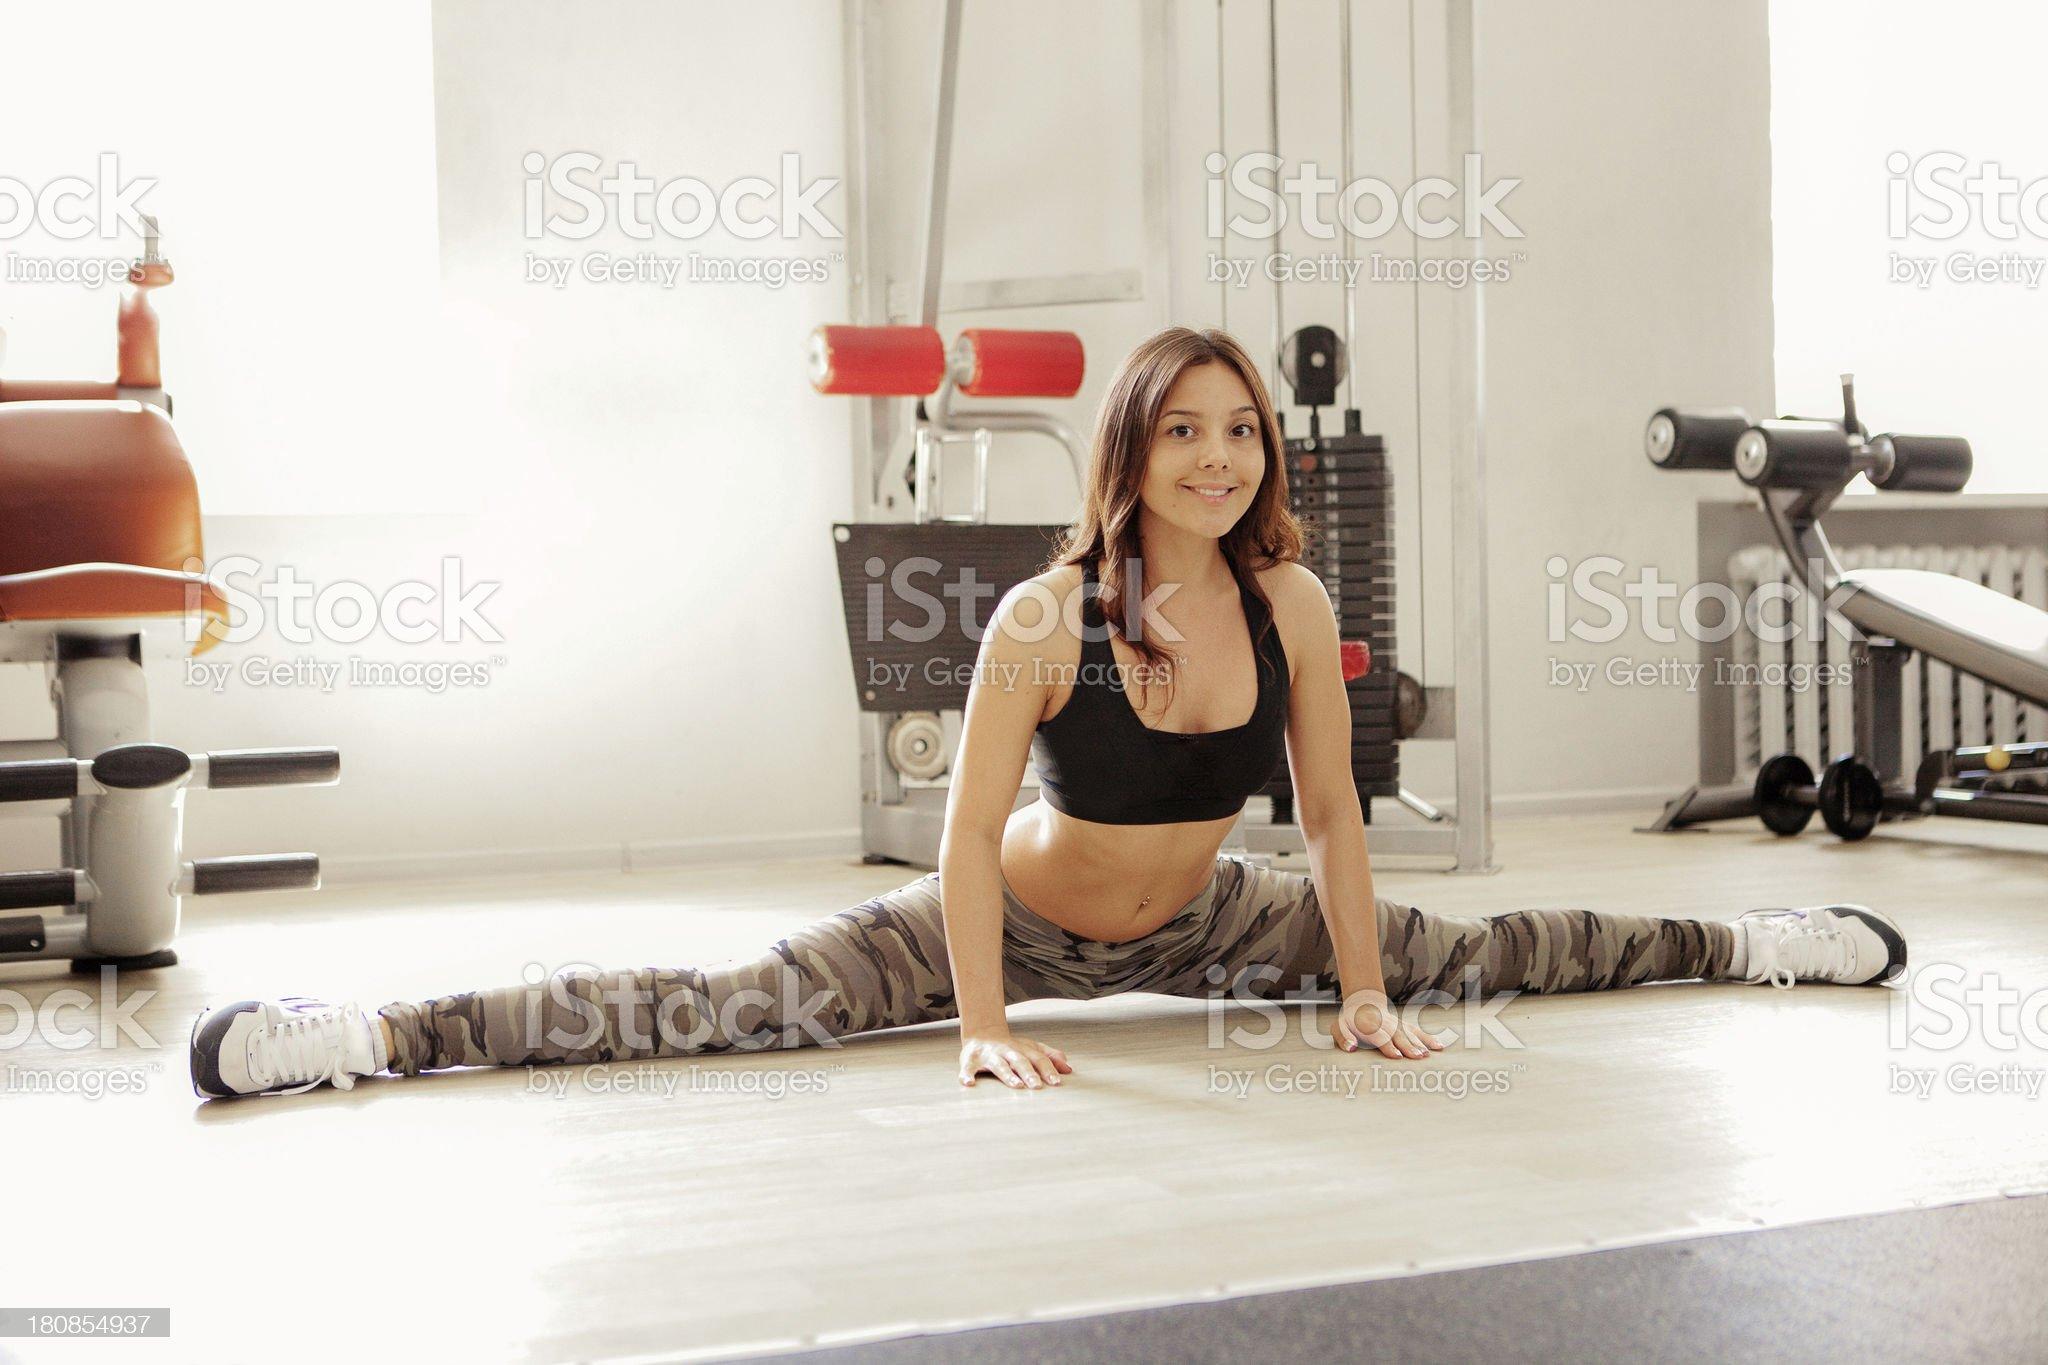 Fitness. royalty-free stock photo